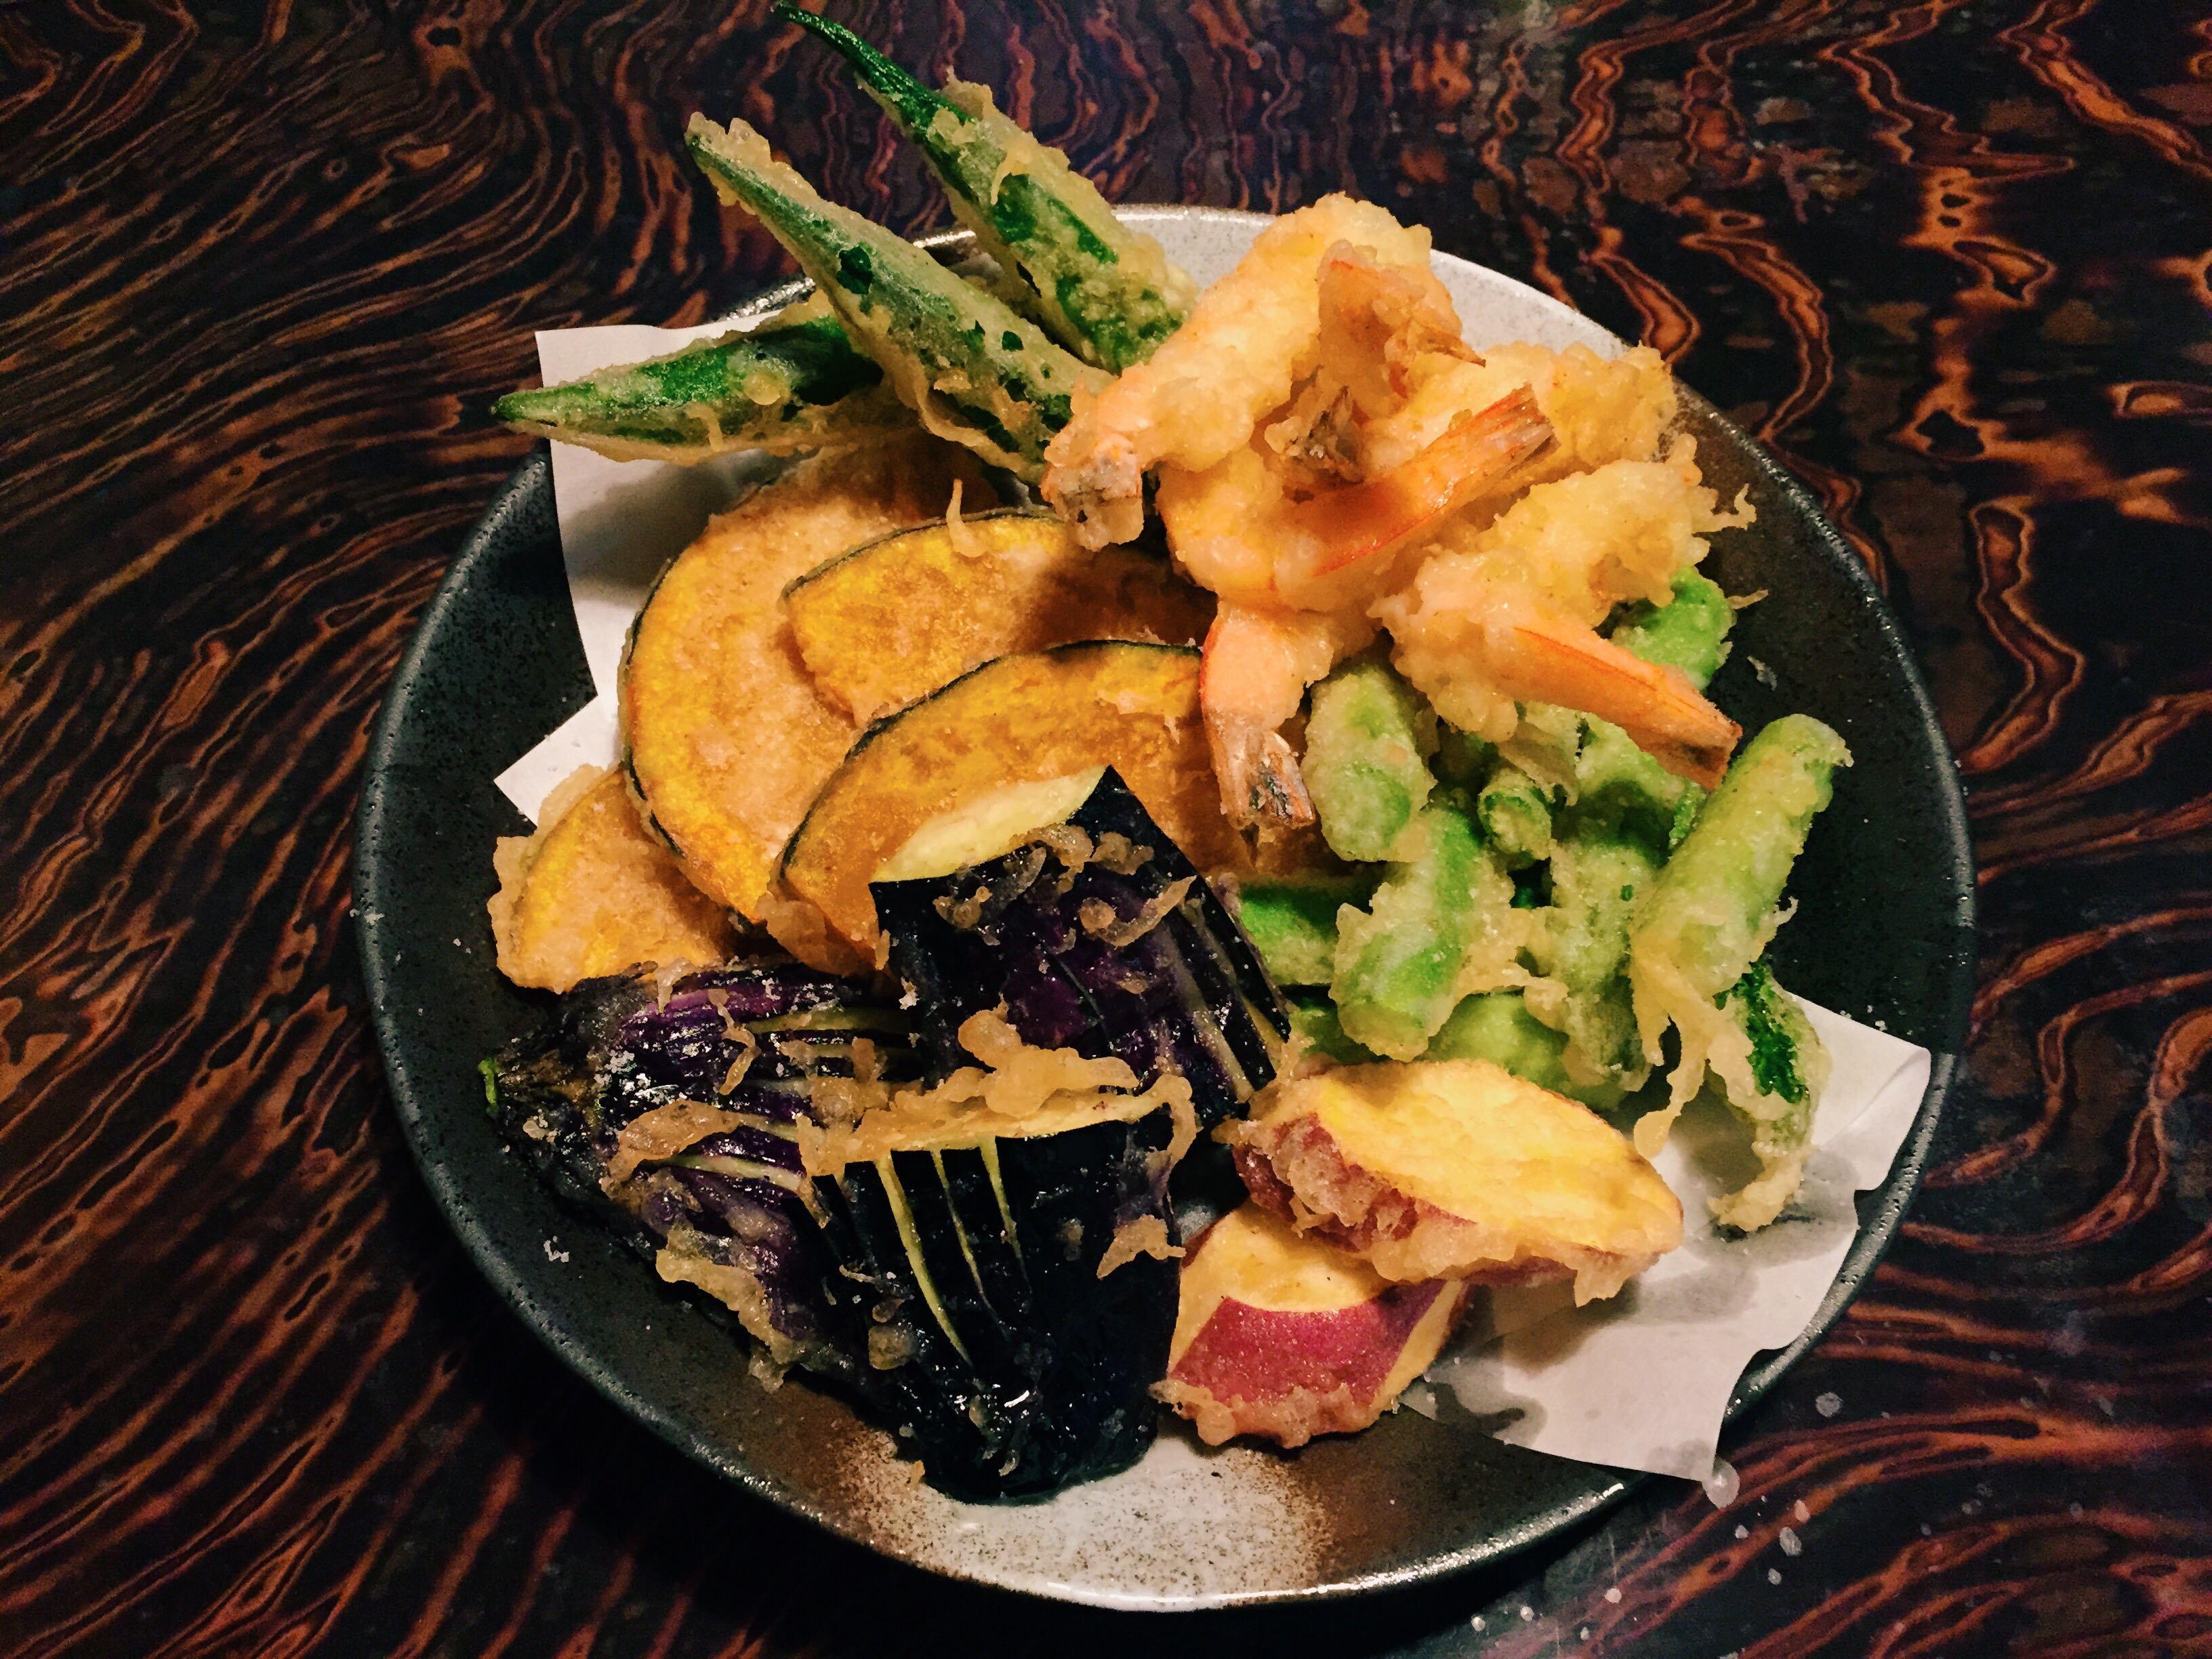 Okra tempura